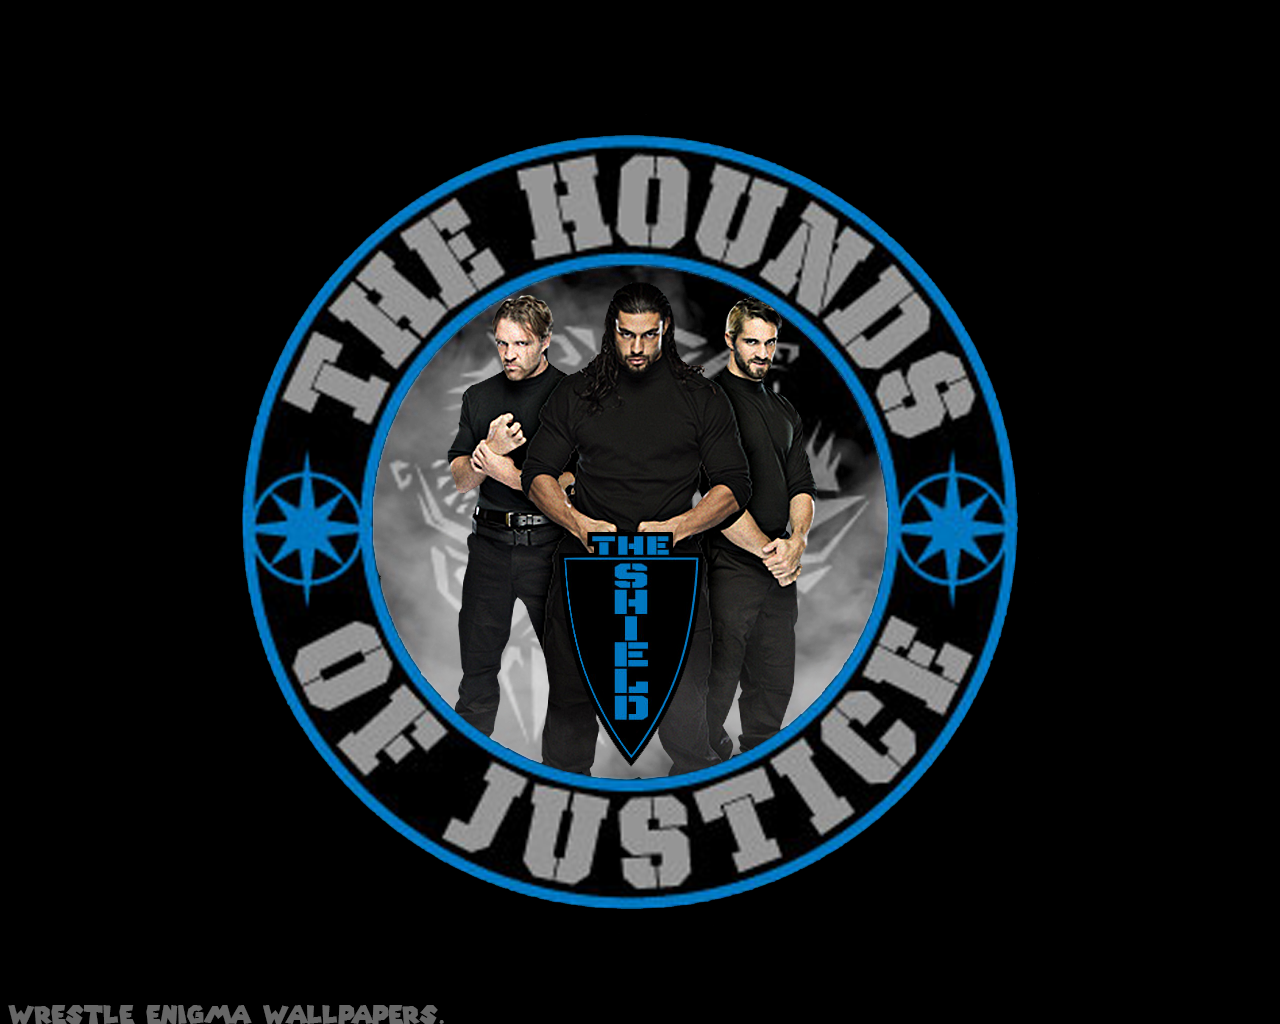 The shield wwe Logos.